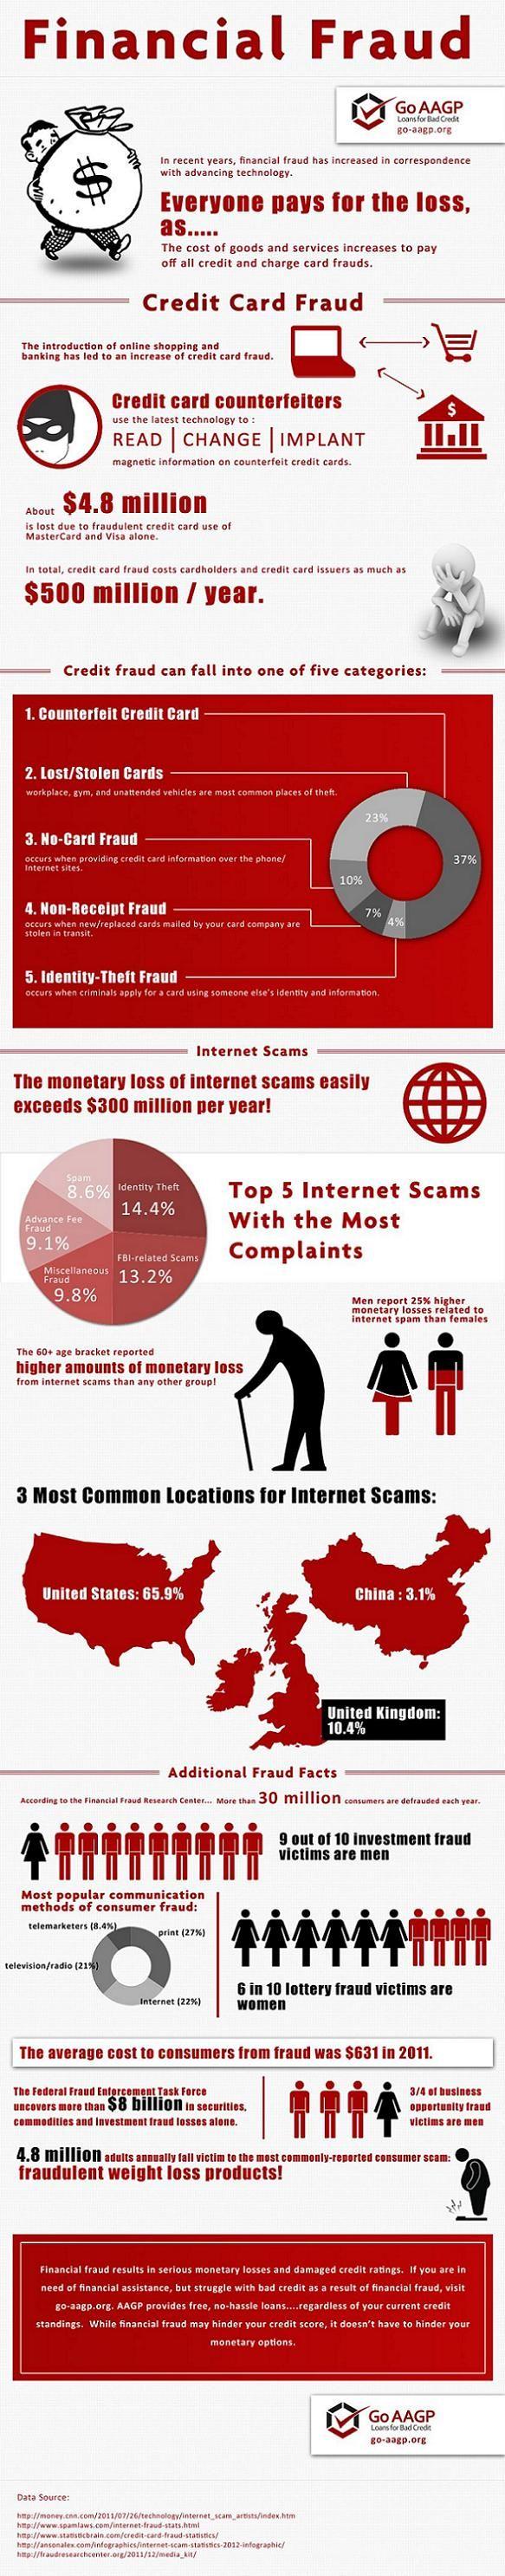 OnGuardOnline | Consumer Information